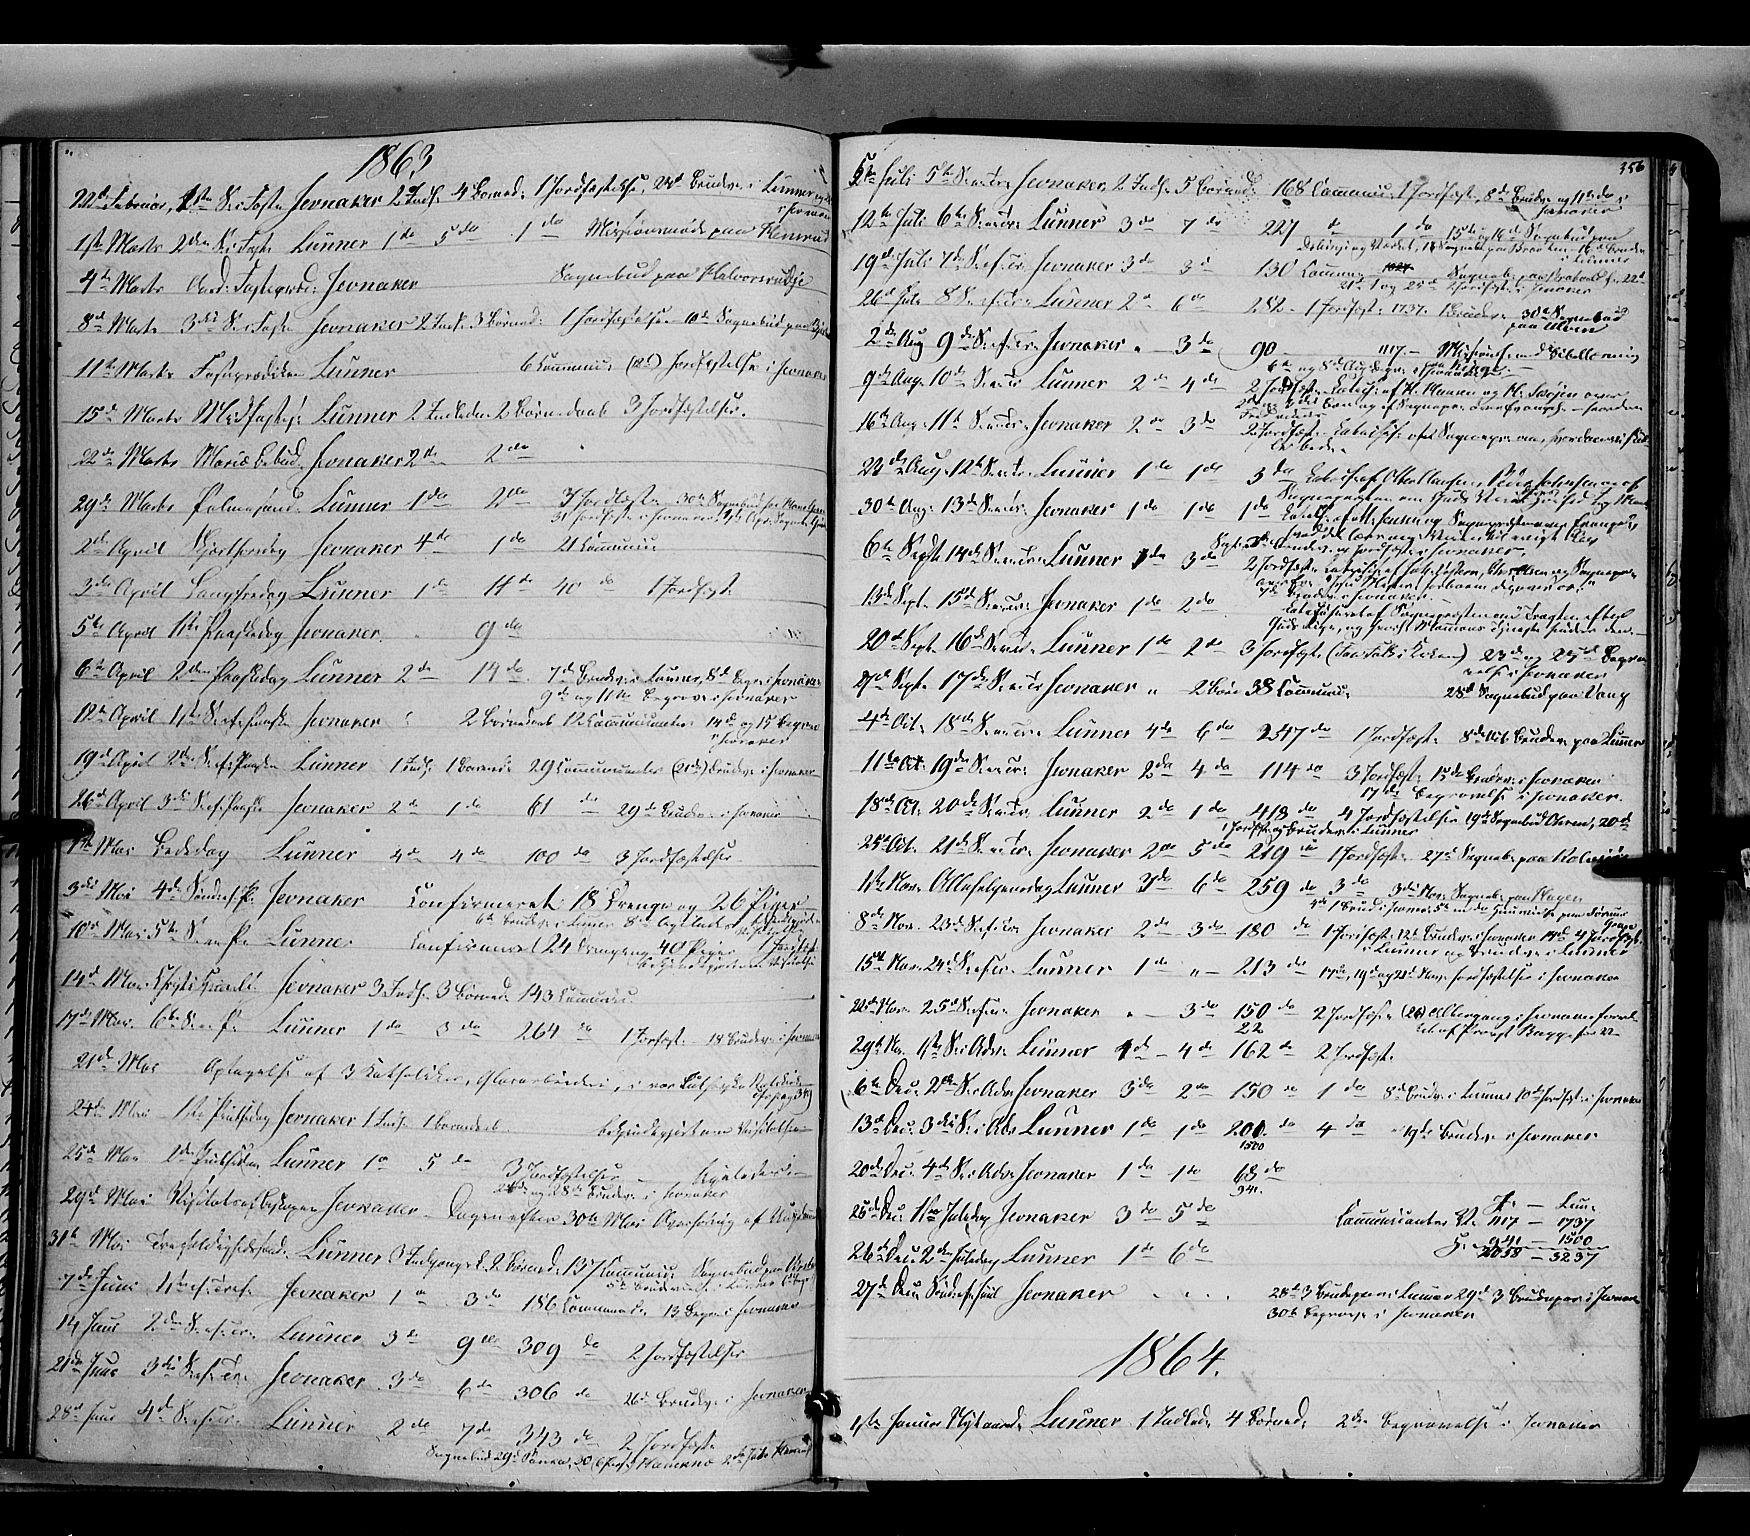 SAH, Jevnaker prestekontor, Ministerialbok nr. 7, 1858-1876, s. 356